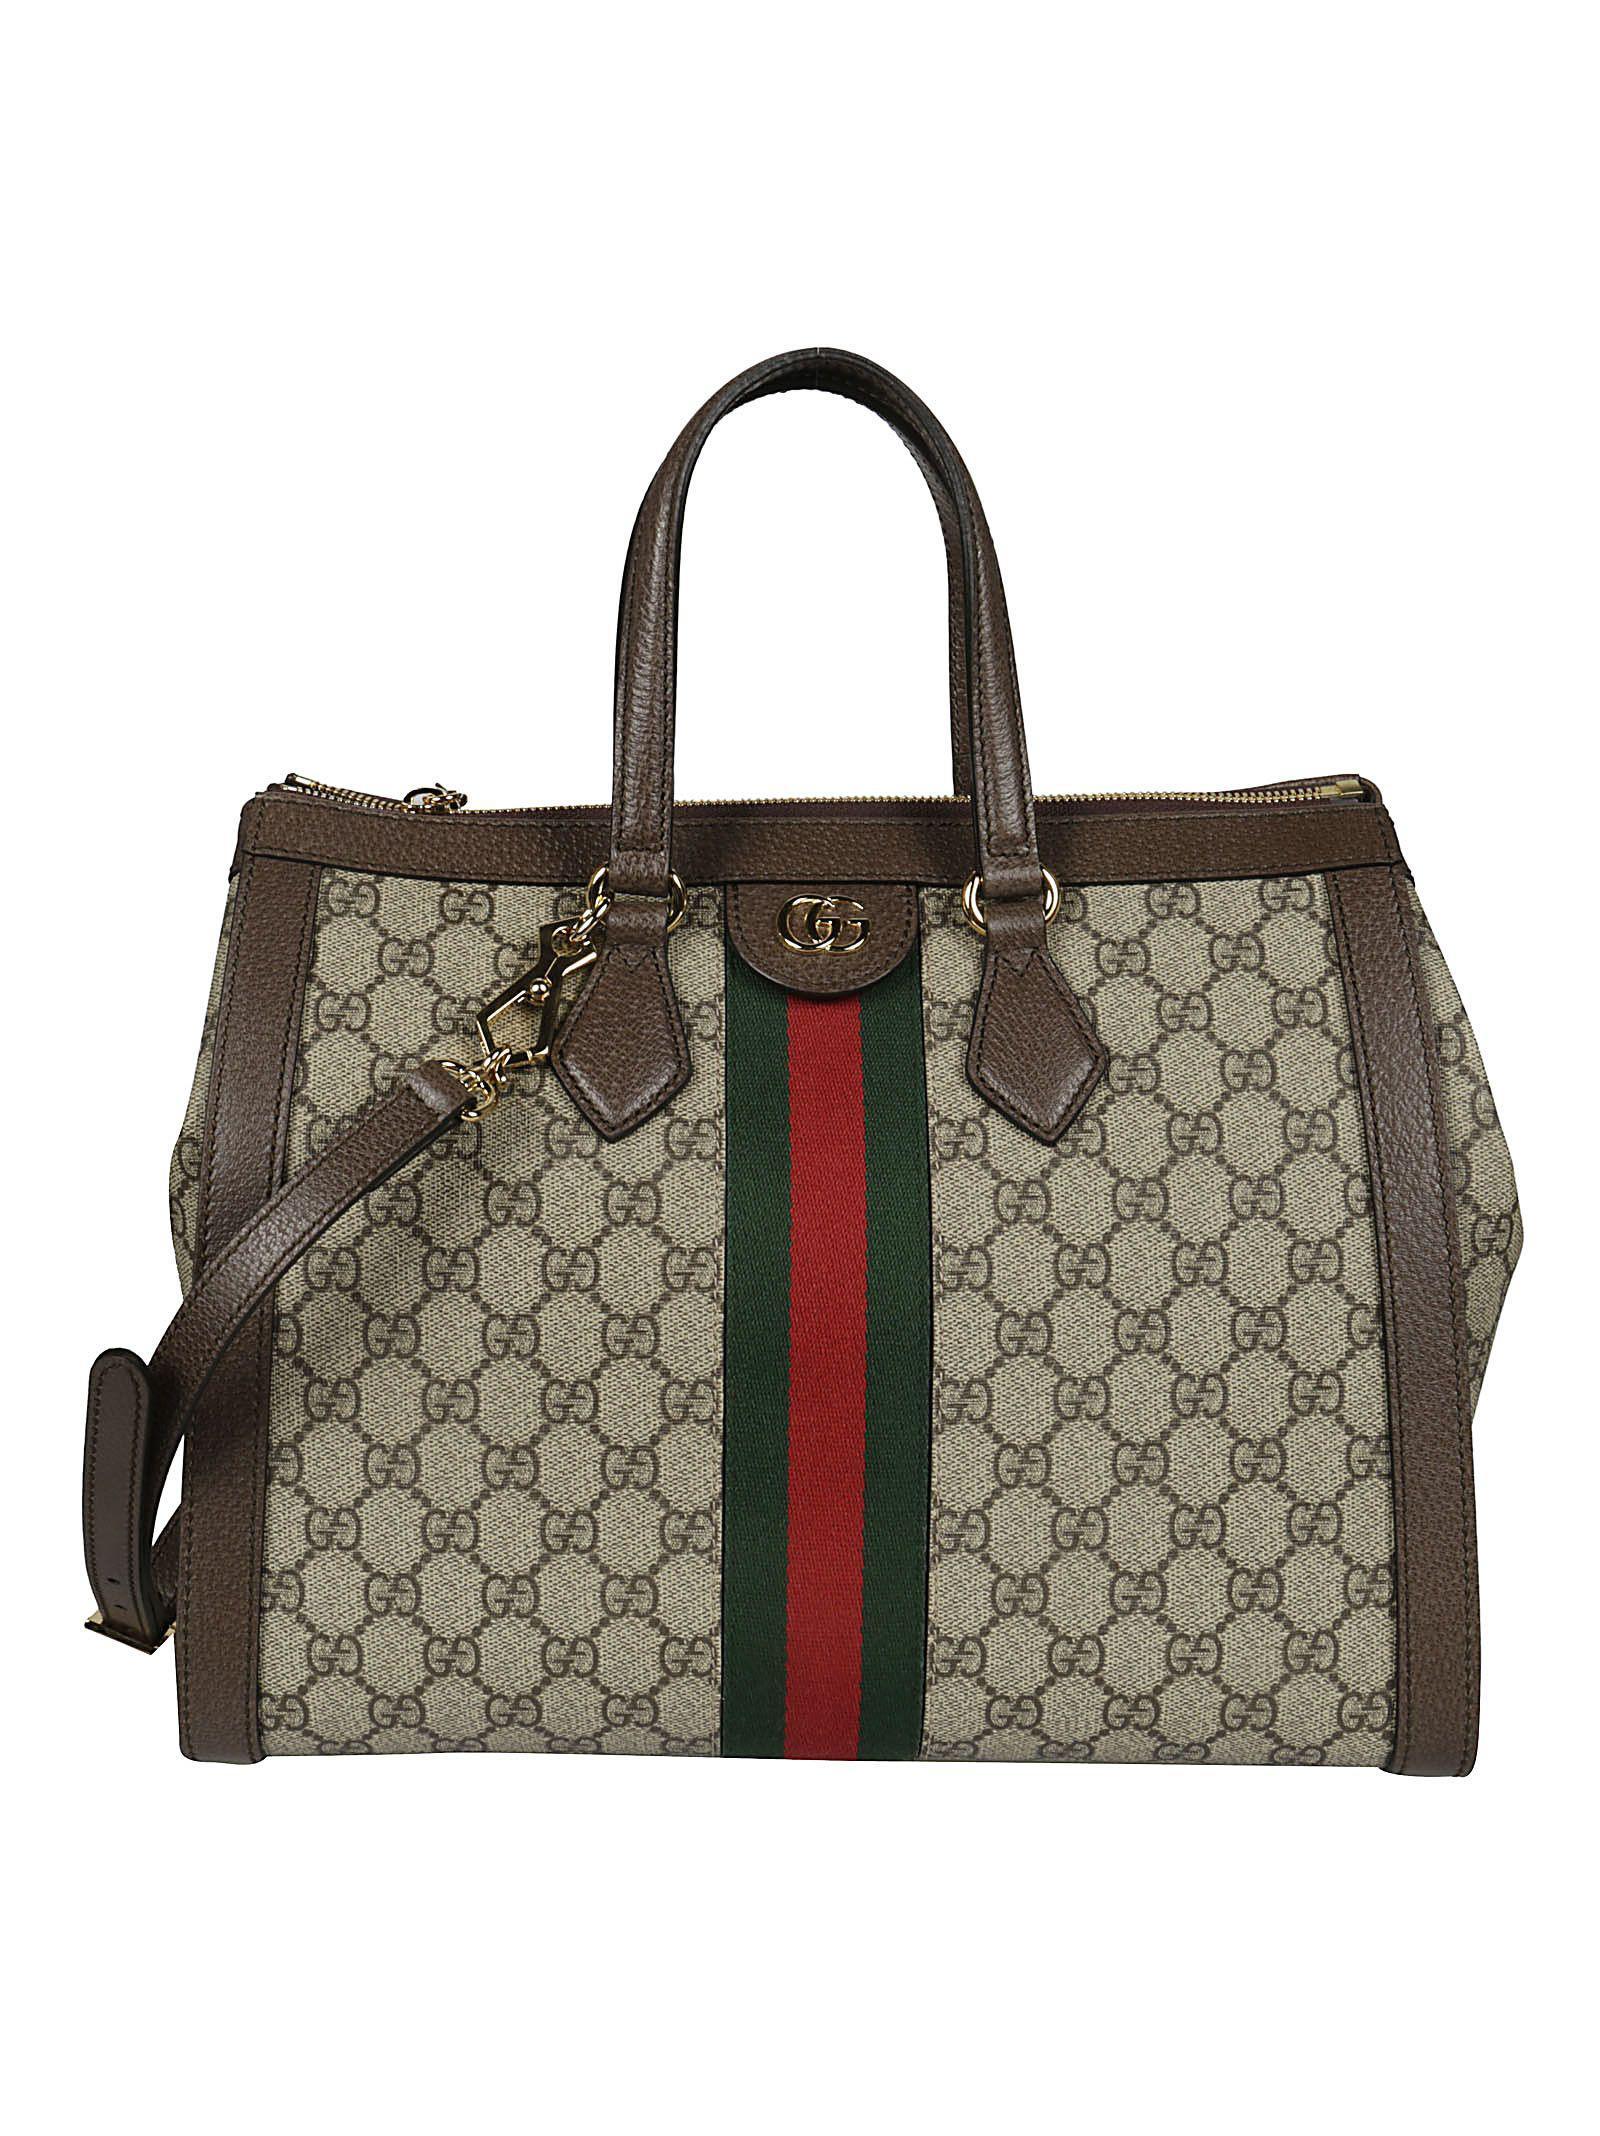 f10ea543988 Gucci Ophidia Medium Gg Supreme Canvas Web Top-Handle Tote Bag In 8745 Beige